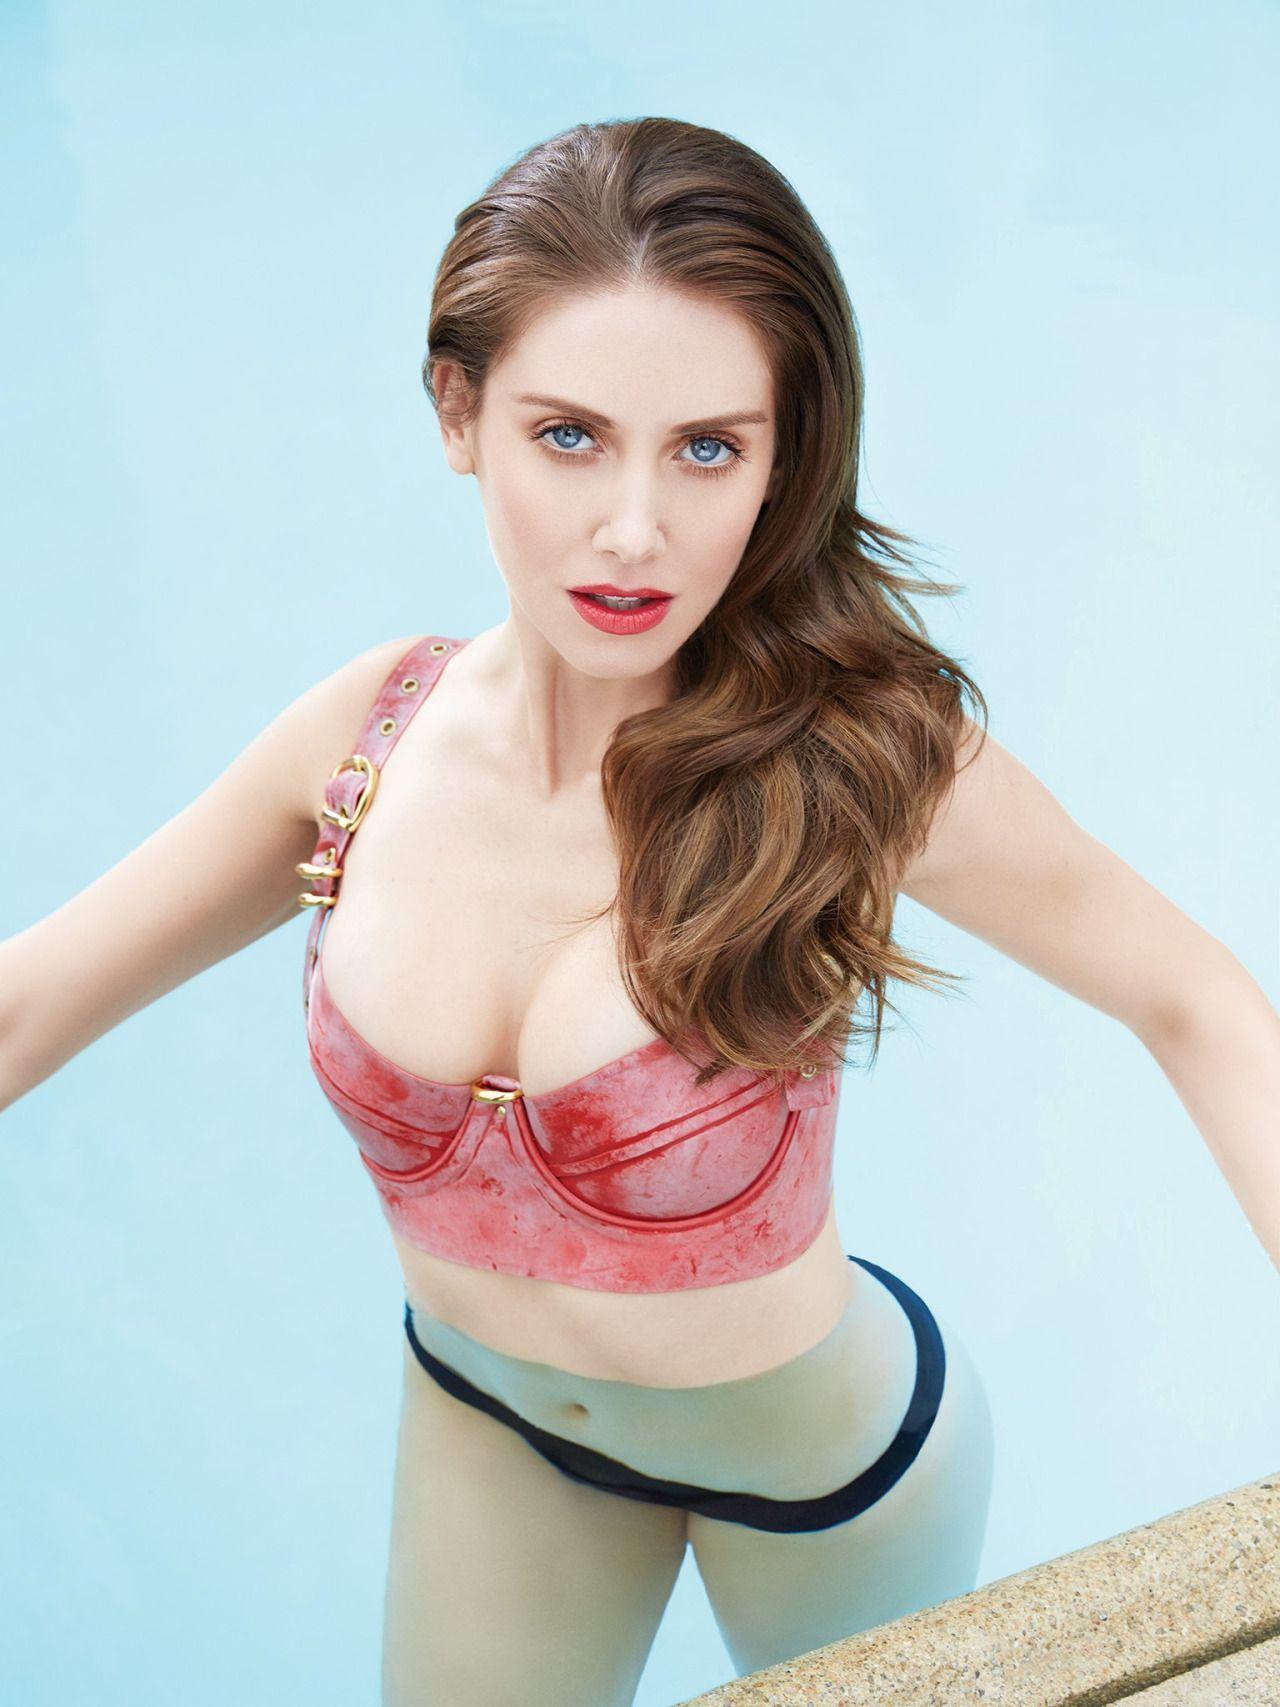 Cleavage Alison Carlson nudes (47 foto and video), Topless, Bikini, Feet, see through 2019